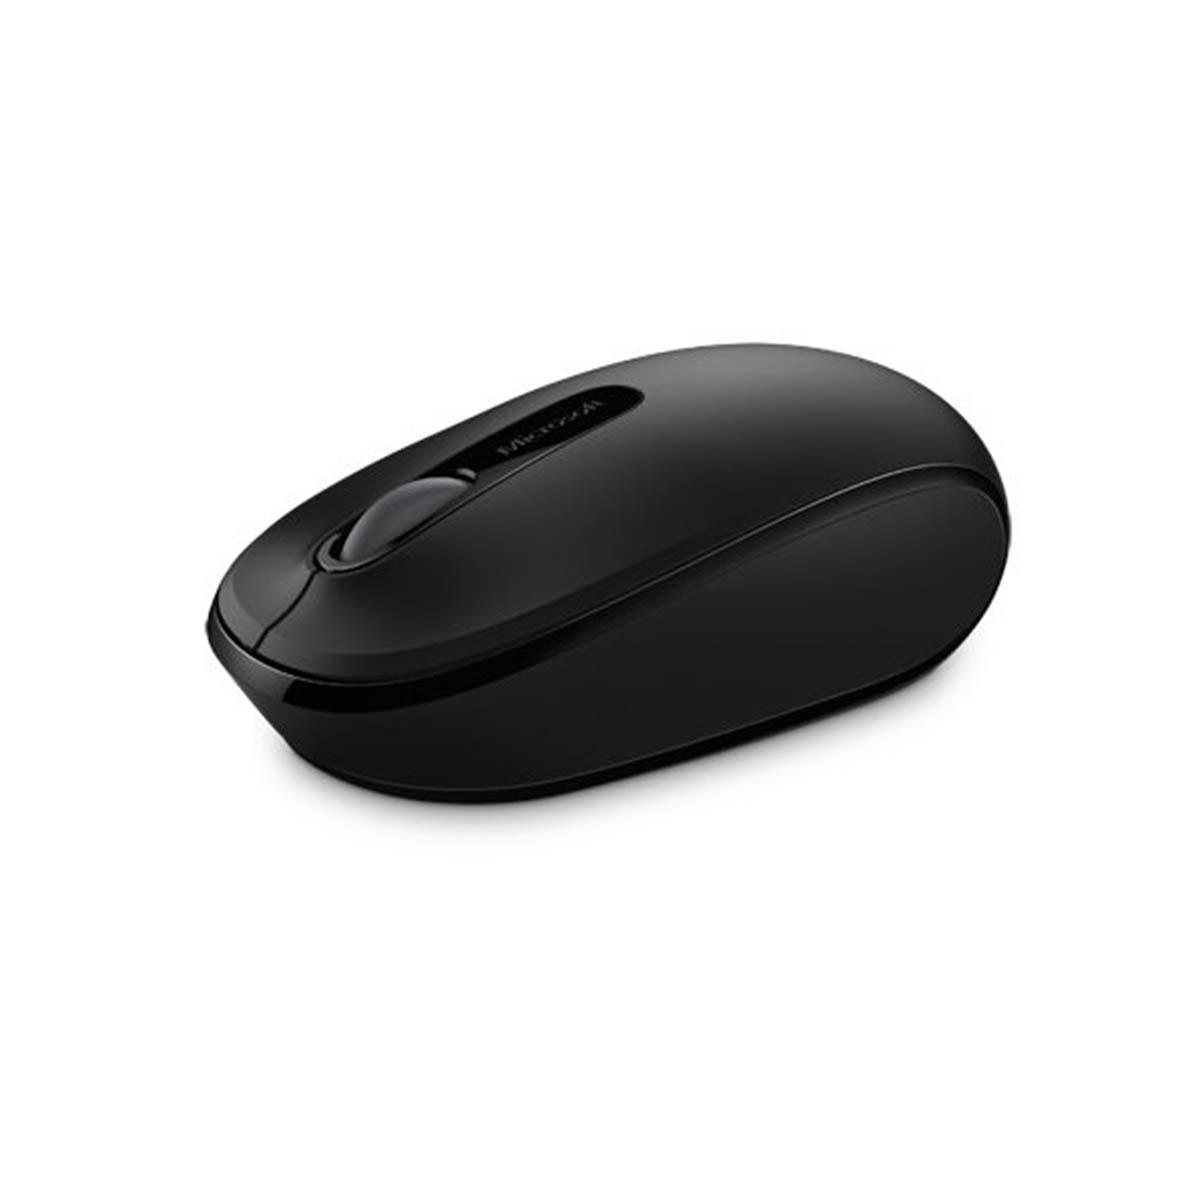 Mouse Microsoft Óptico Inalámbrico 1850 U7Z-00008